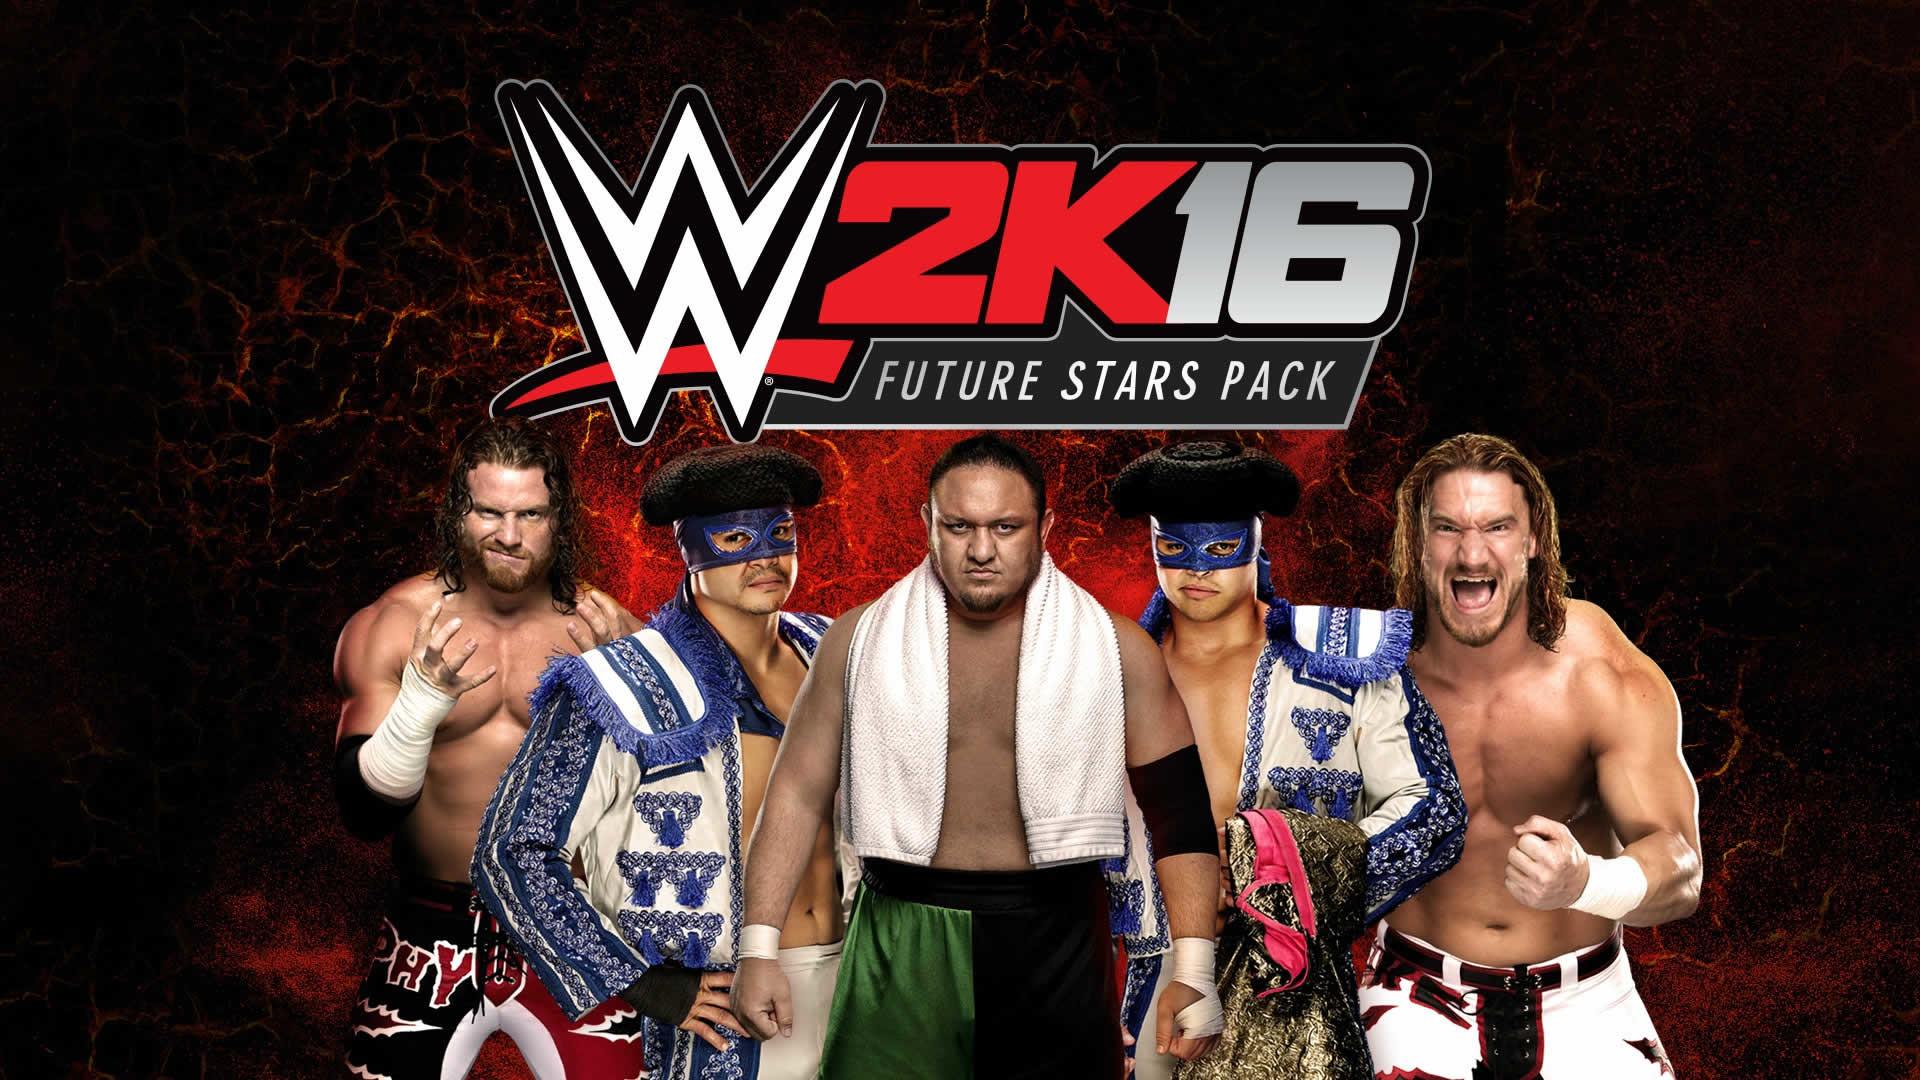 … Wallpaper FutureStarsPack WWE2K16 Wallpaper HOFShowcase